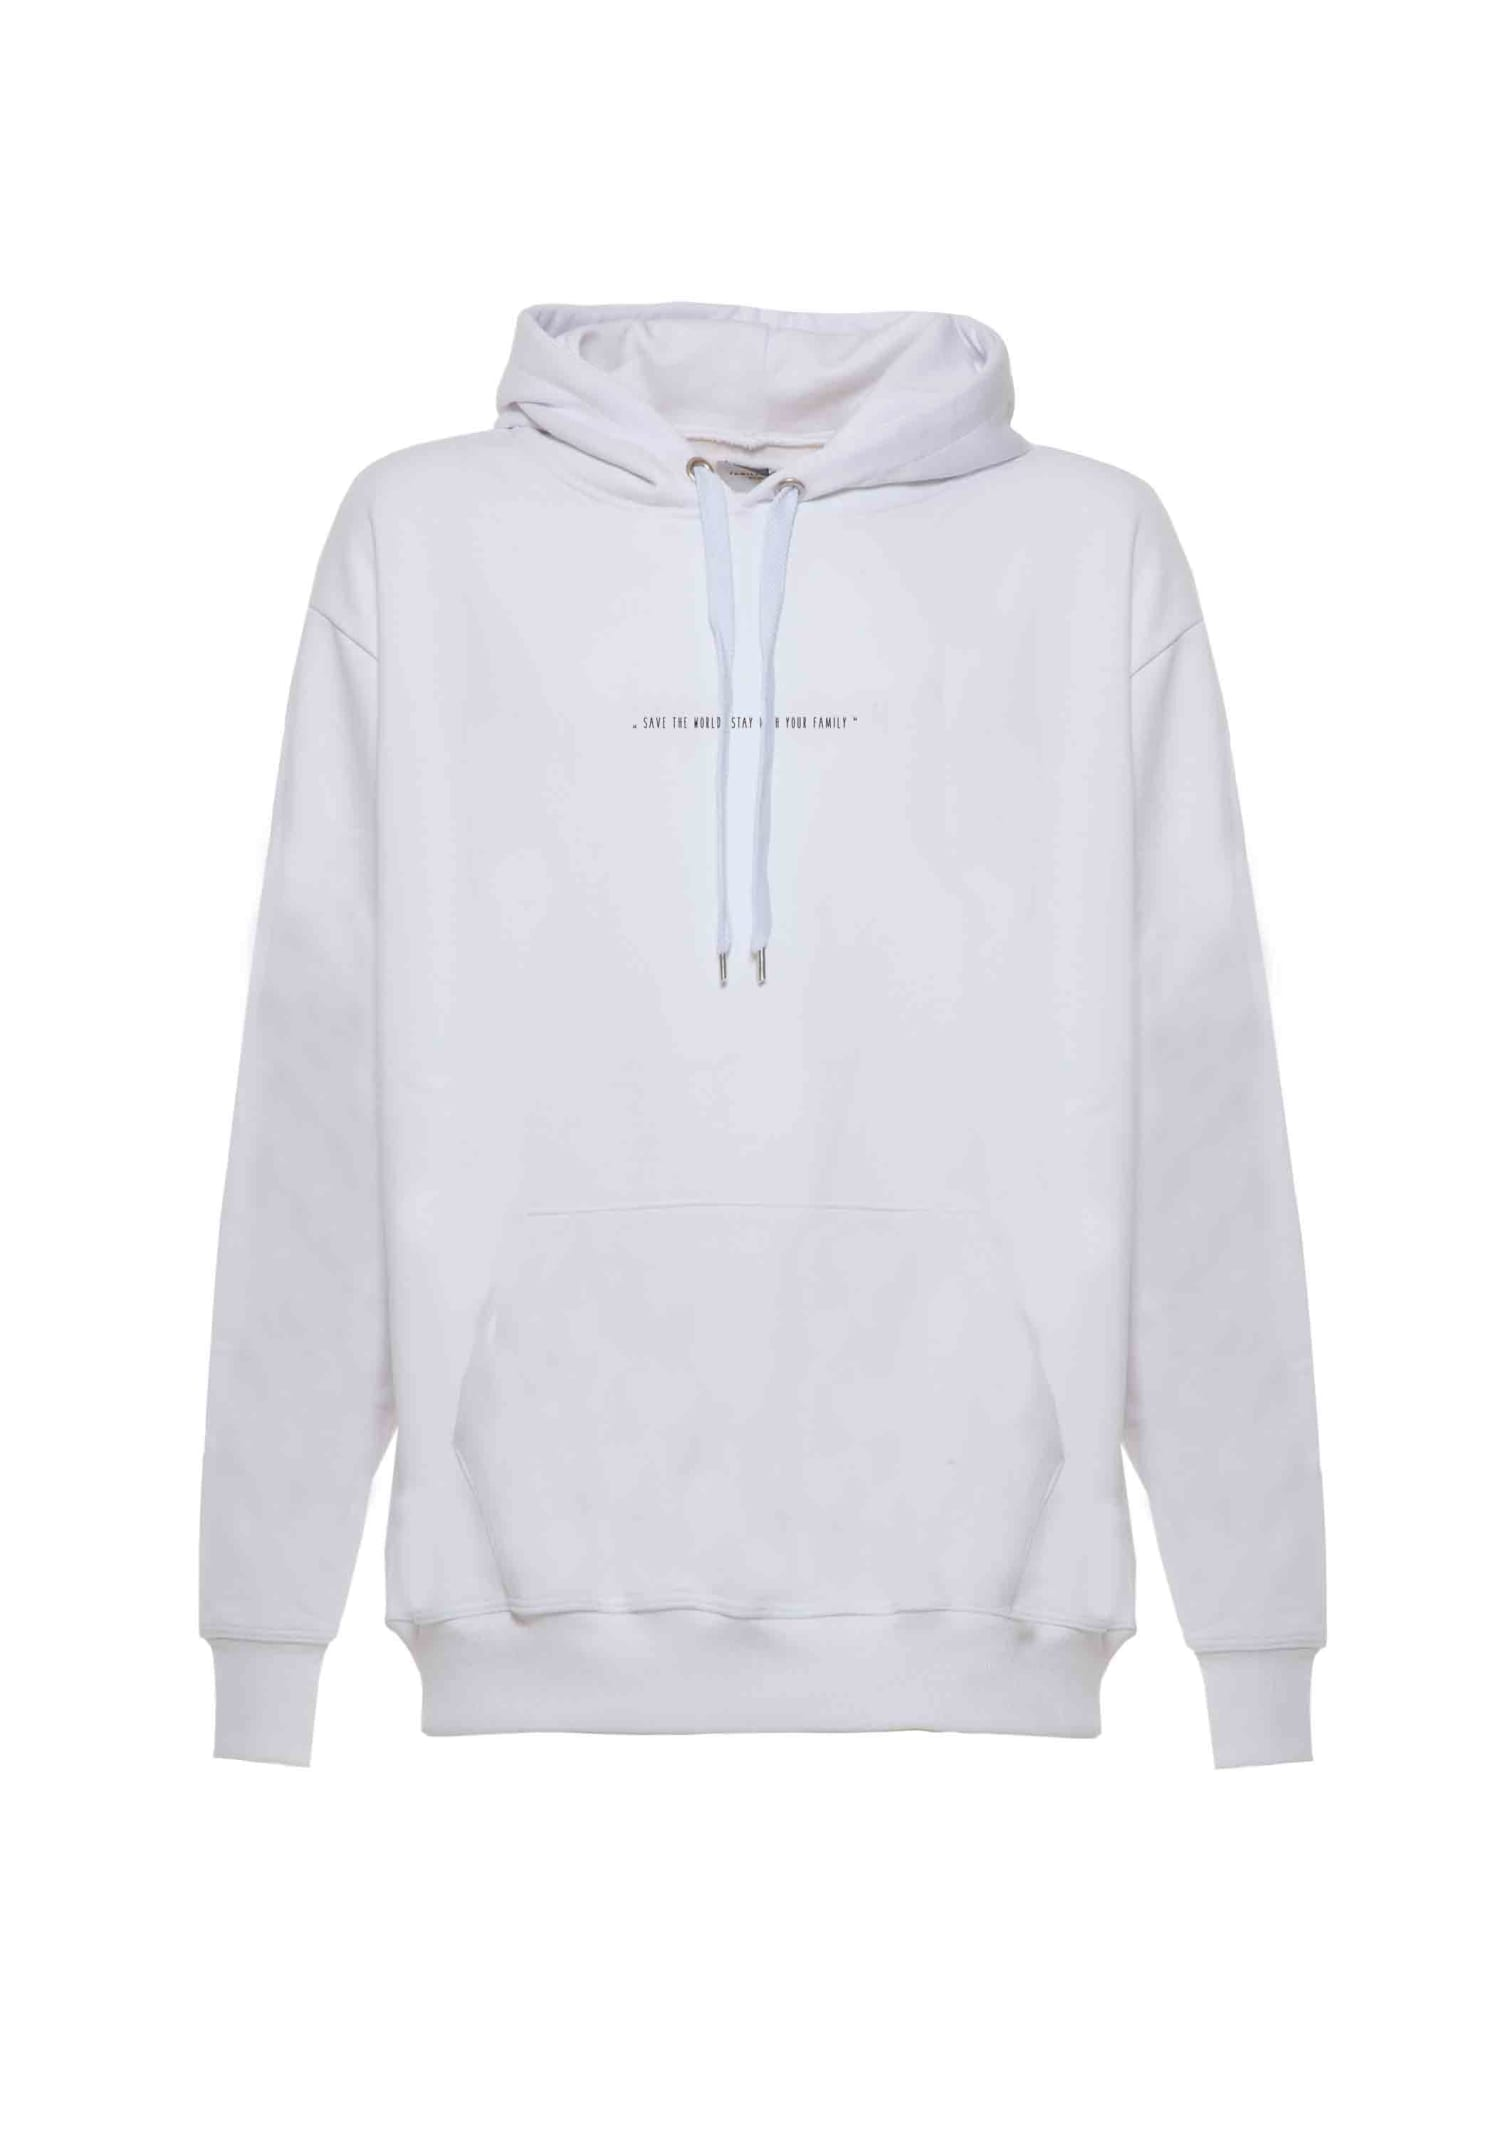 Hoodie Iconic White